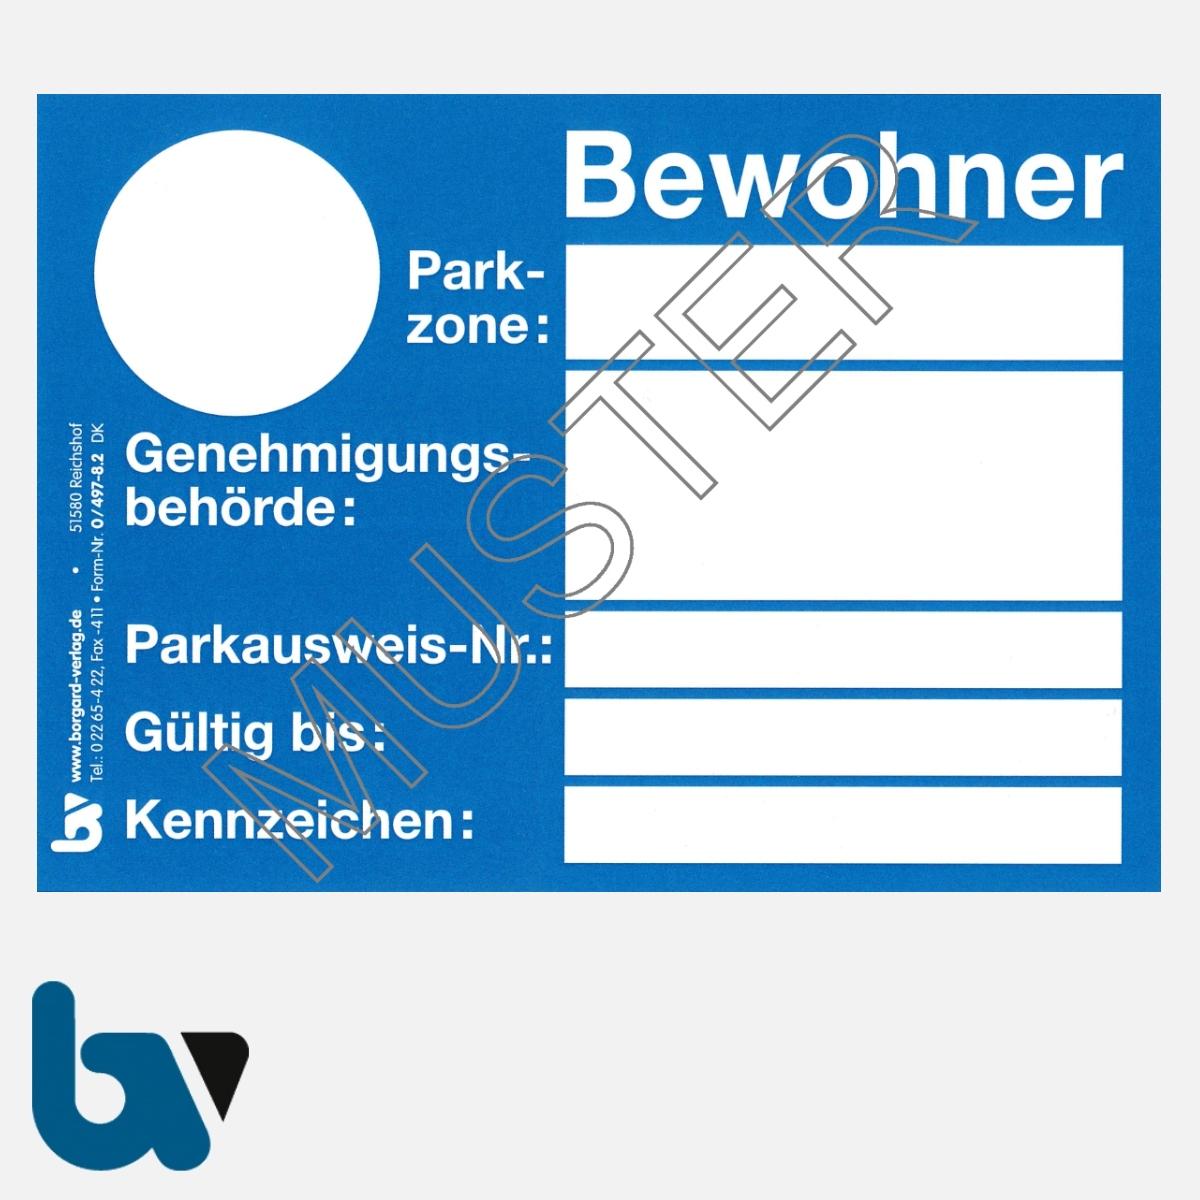 0/497-8.2 Bewohnerparkausweis Muster blau DIN A6 Karton VS | Borgard Verlag GmbH